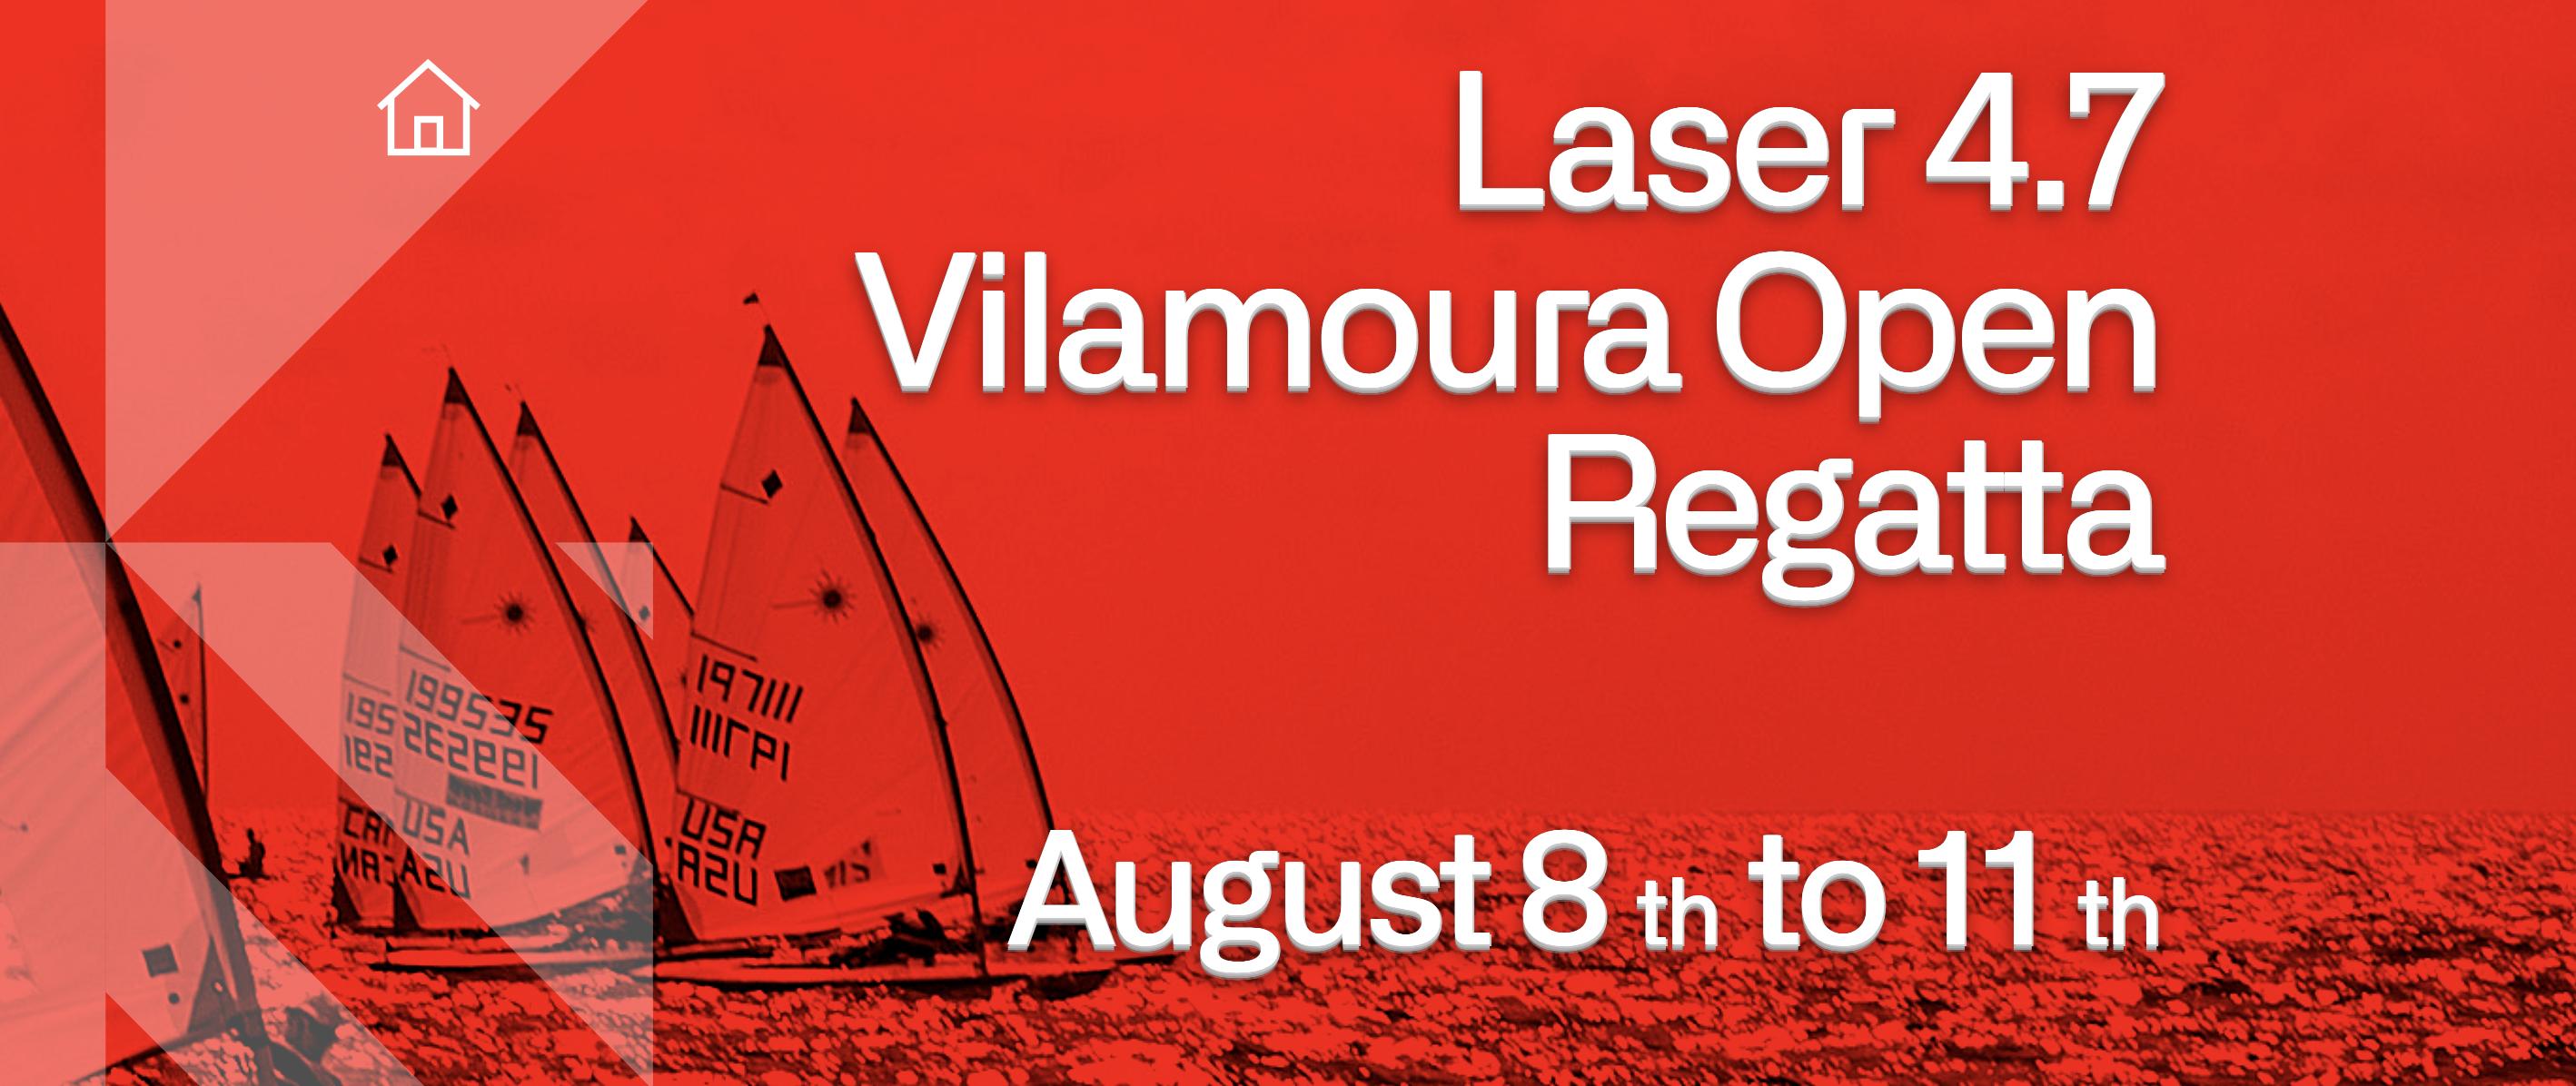 Open Regatta in Vilamoura